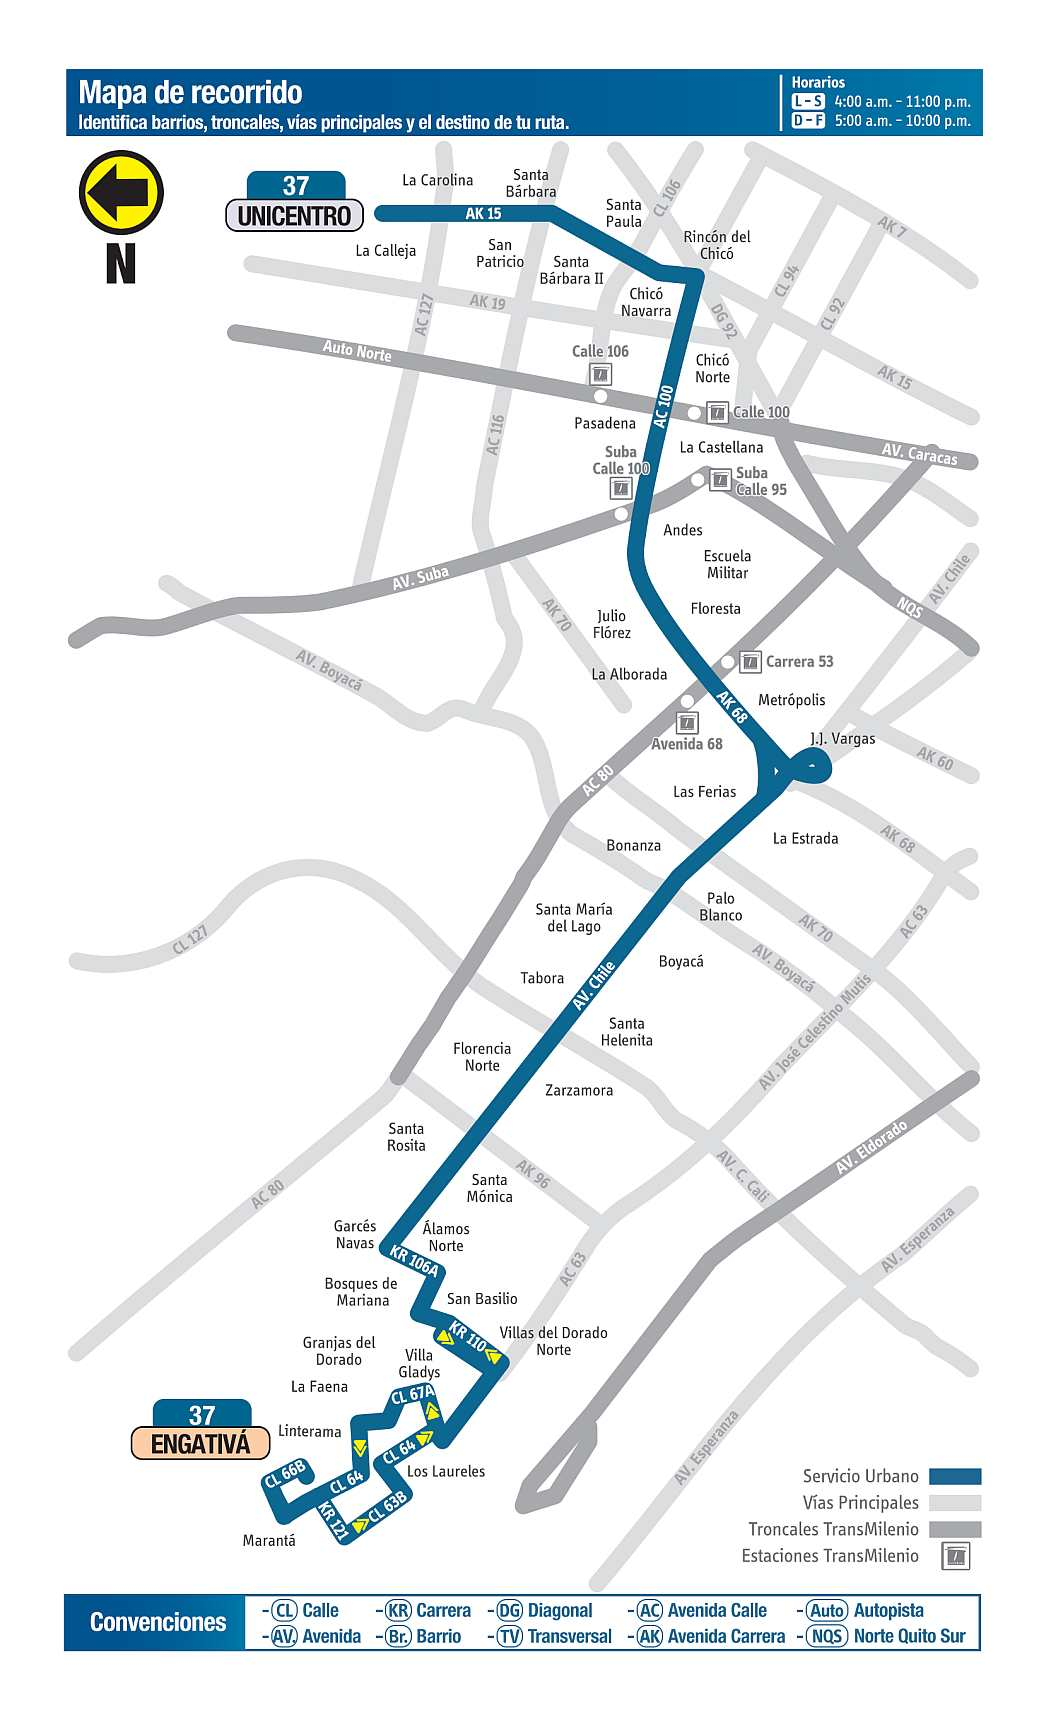 Mapa bus urbano Bogotá: 37 Unicentro - Engativá